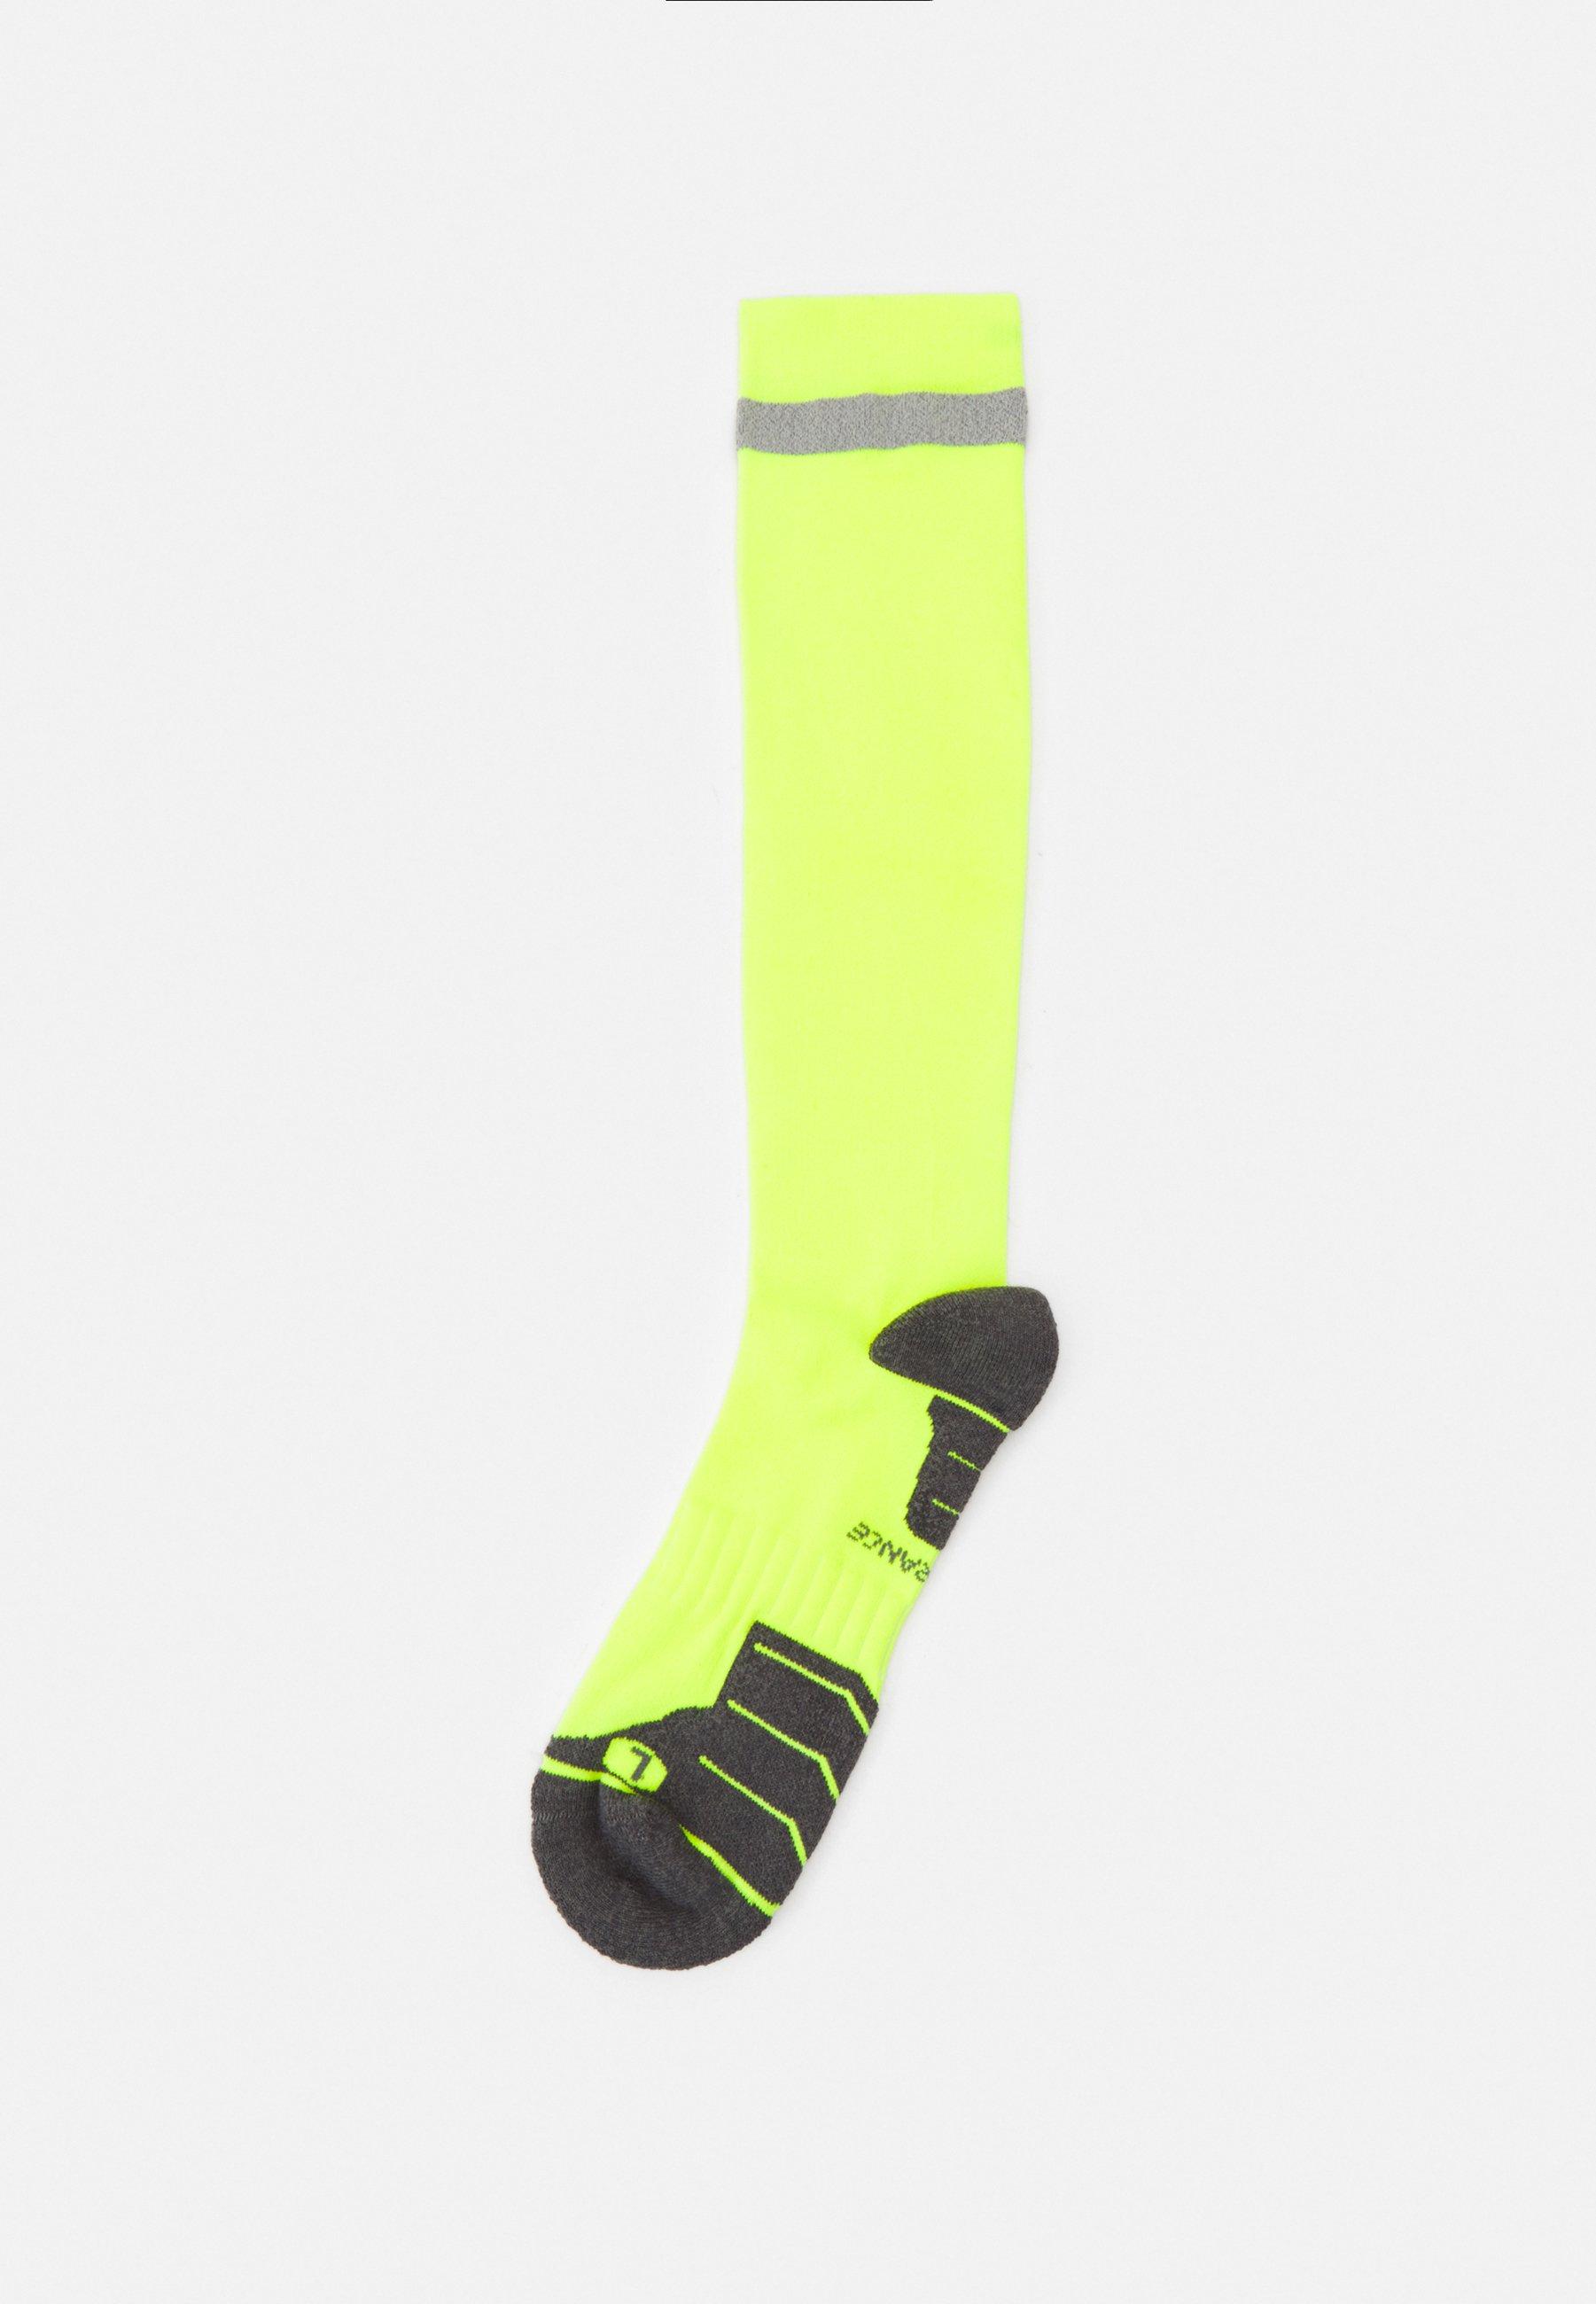 Men TORENT REFLECTIVE LONG COMPRESSION RUNNING SOCK UNISEX - Knee high socks